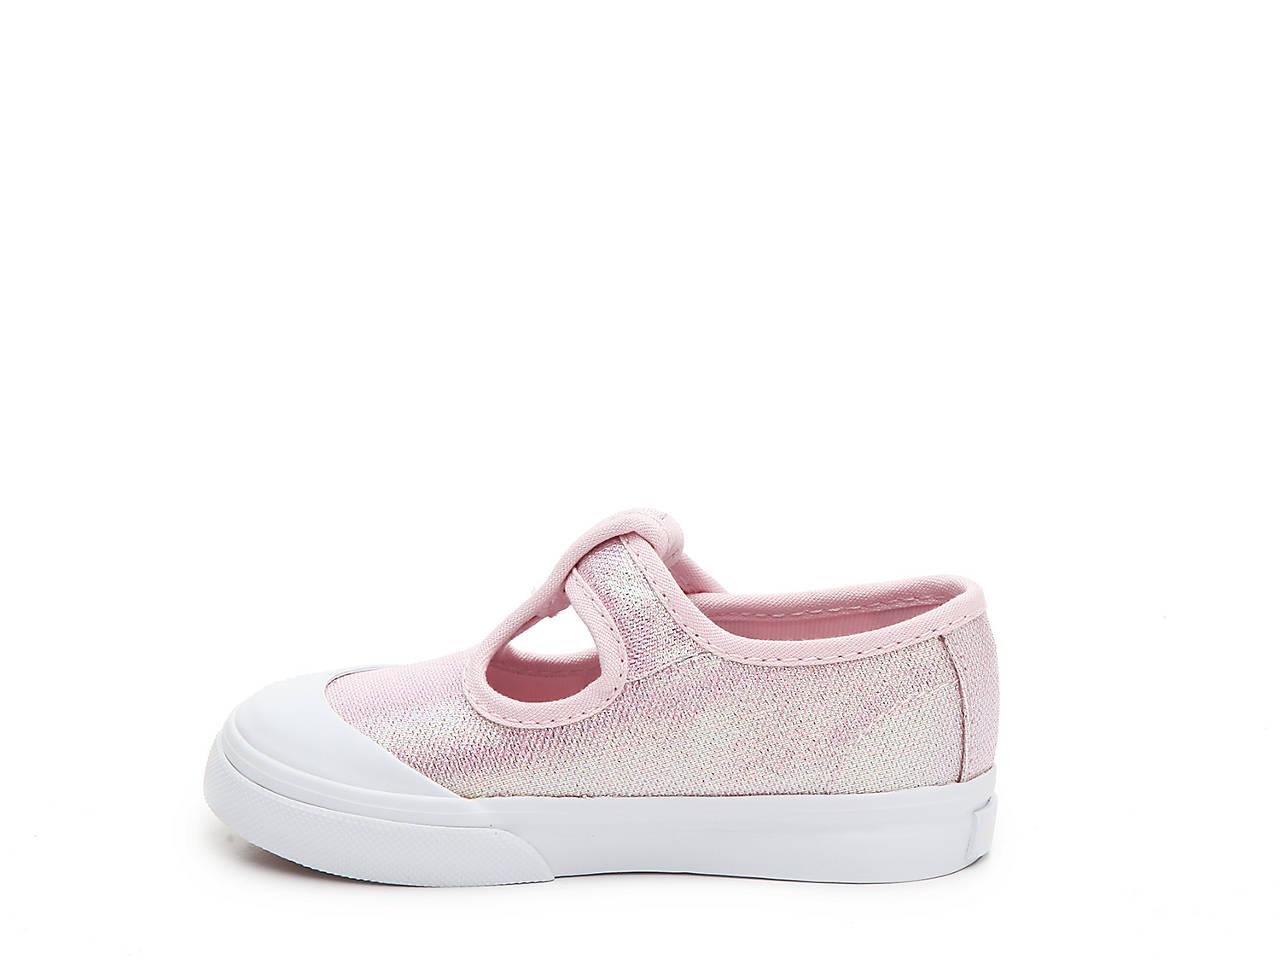 Vans Leena Mary Jane Sneaker Kids' Kids Shoes DSW  DSW